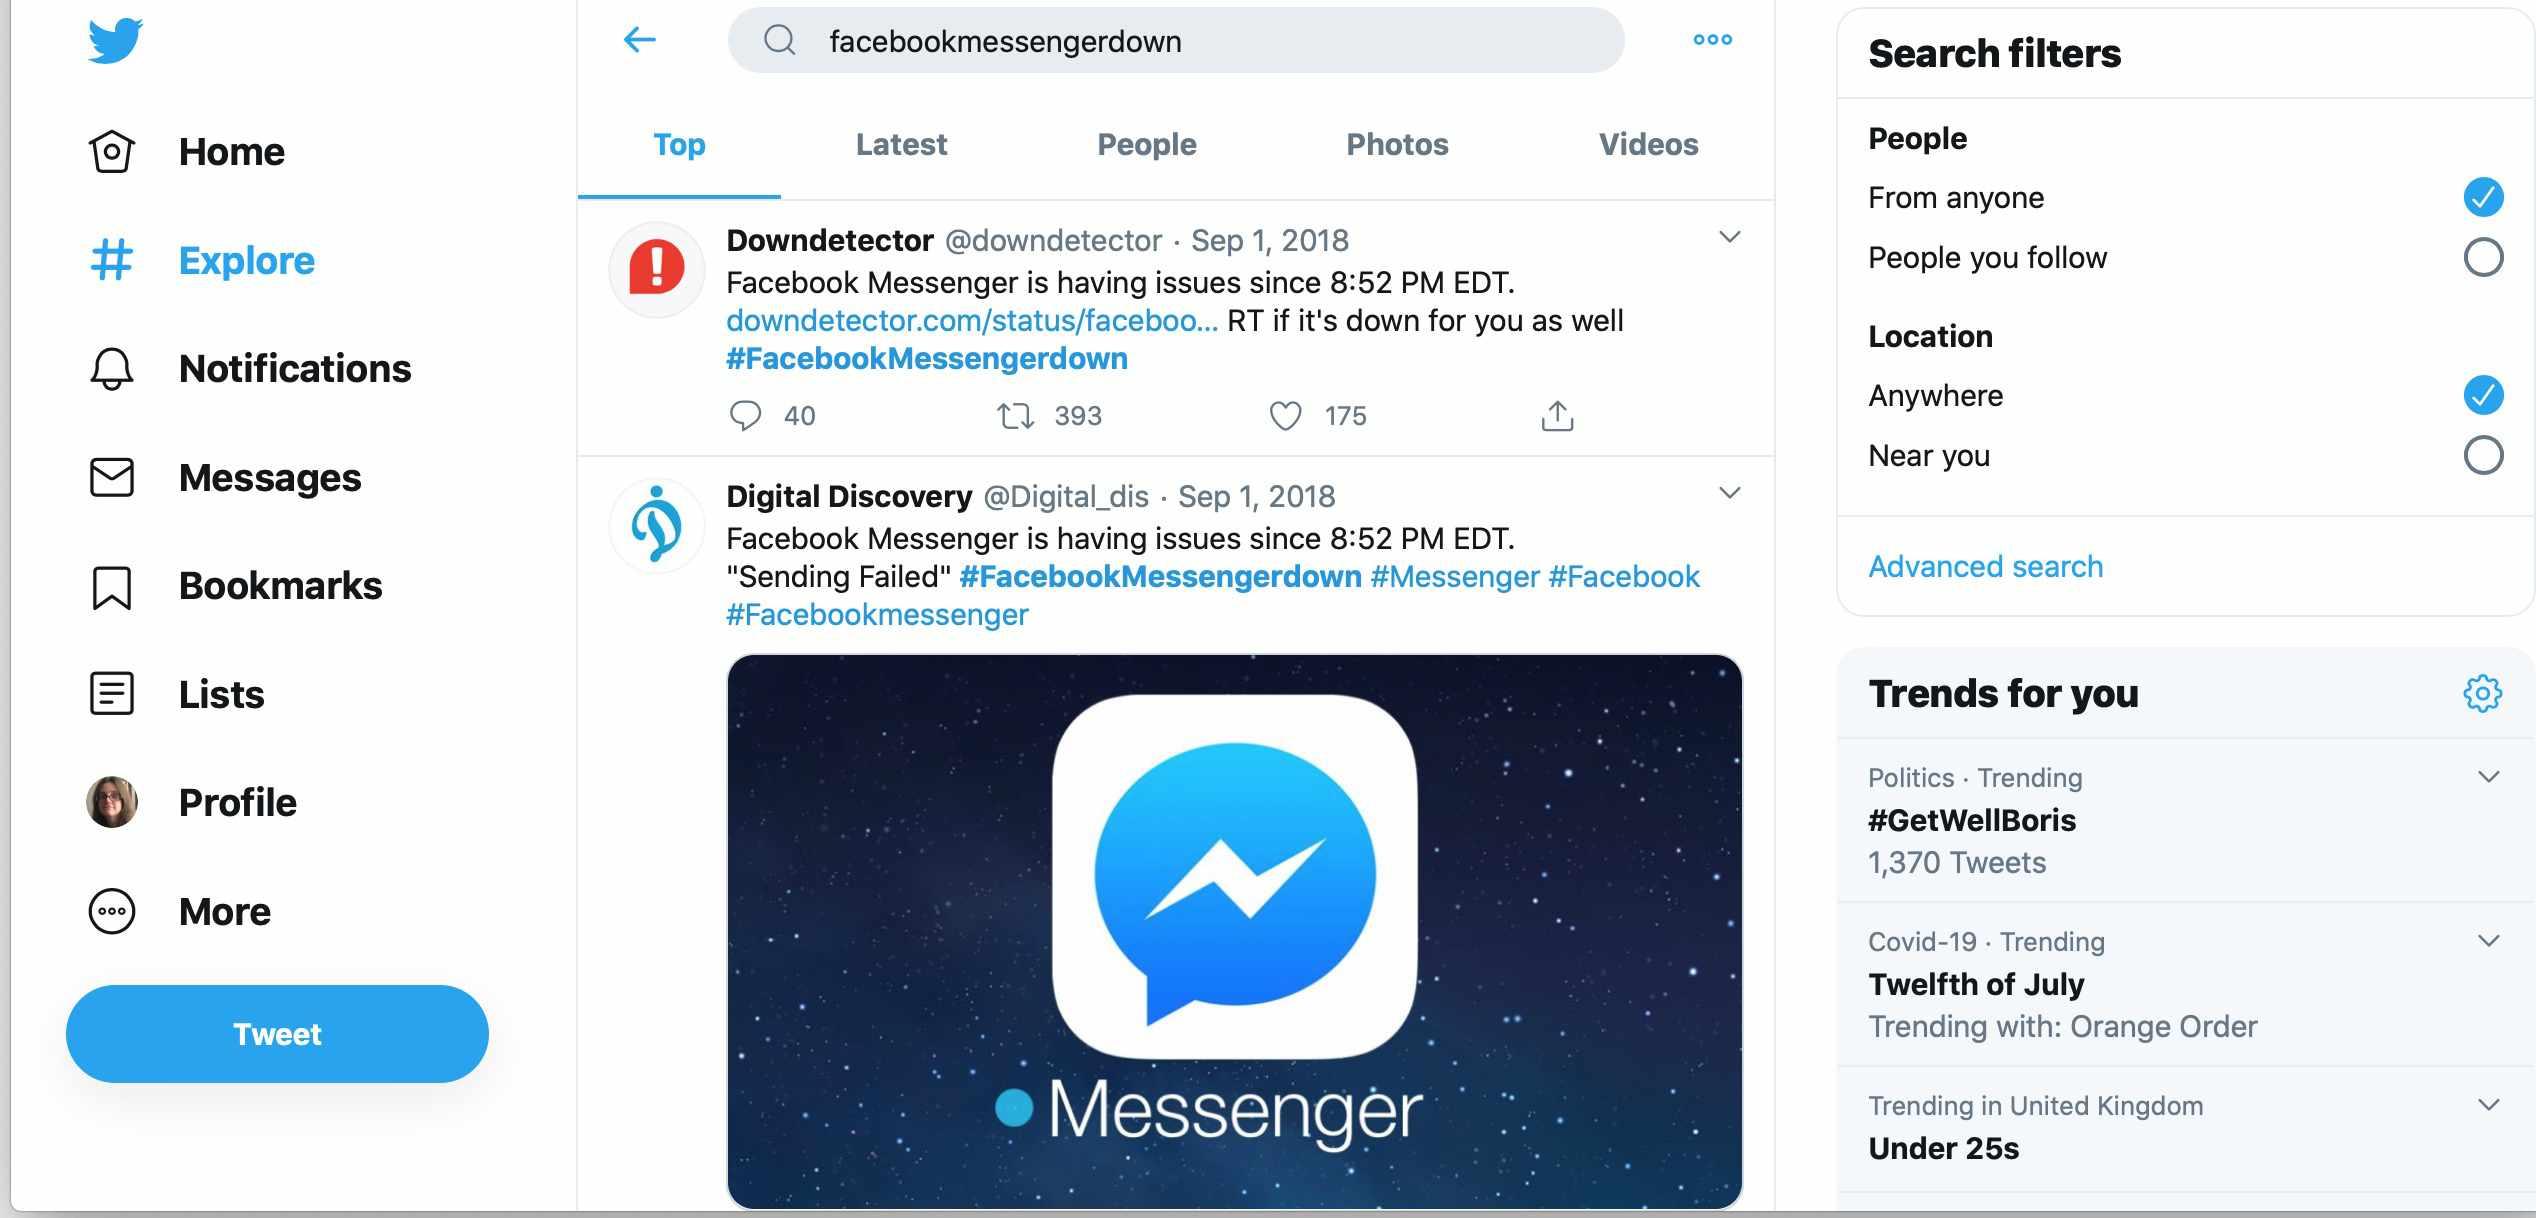 Twitter search for #facebookmessengerdown